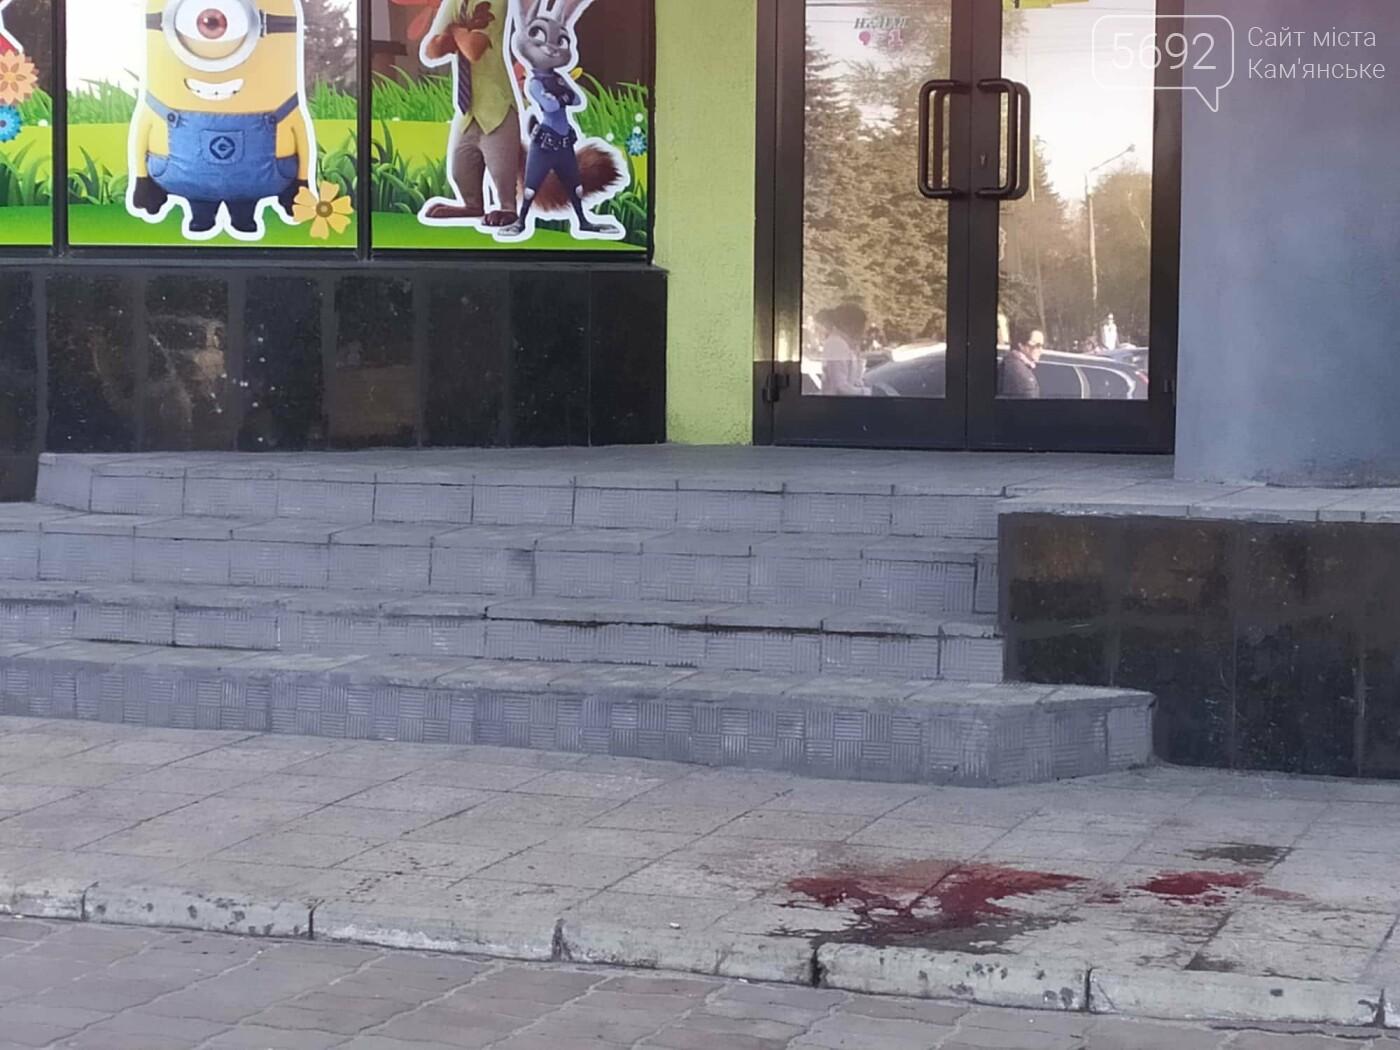 В  центре Каменского подстрелили активиста Евгения Найду, фото-6